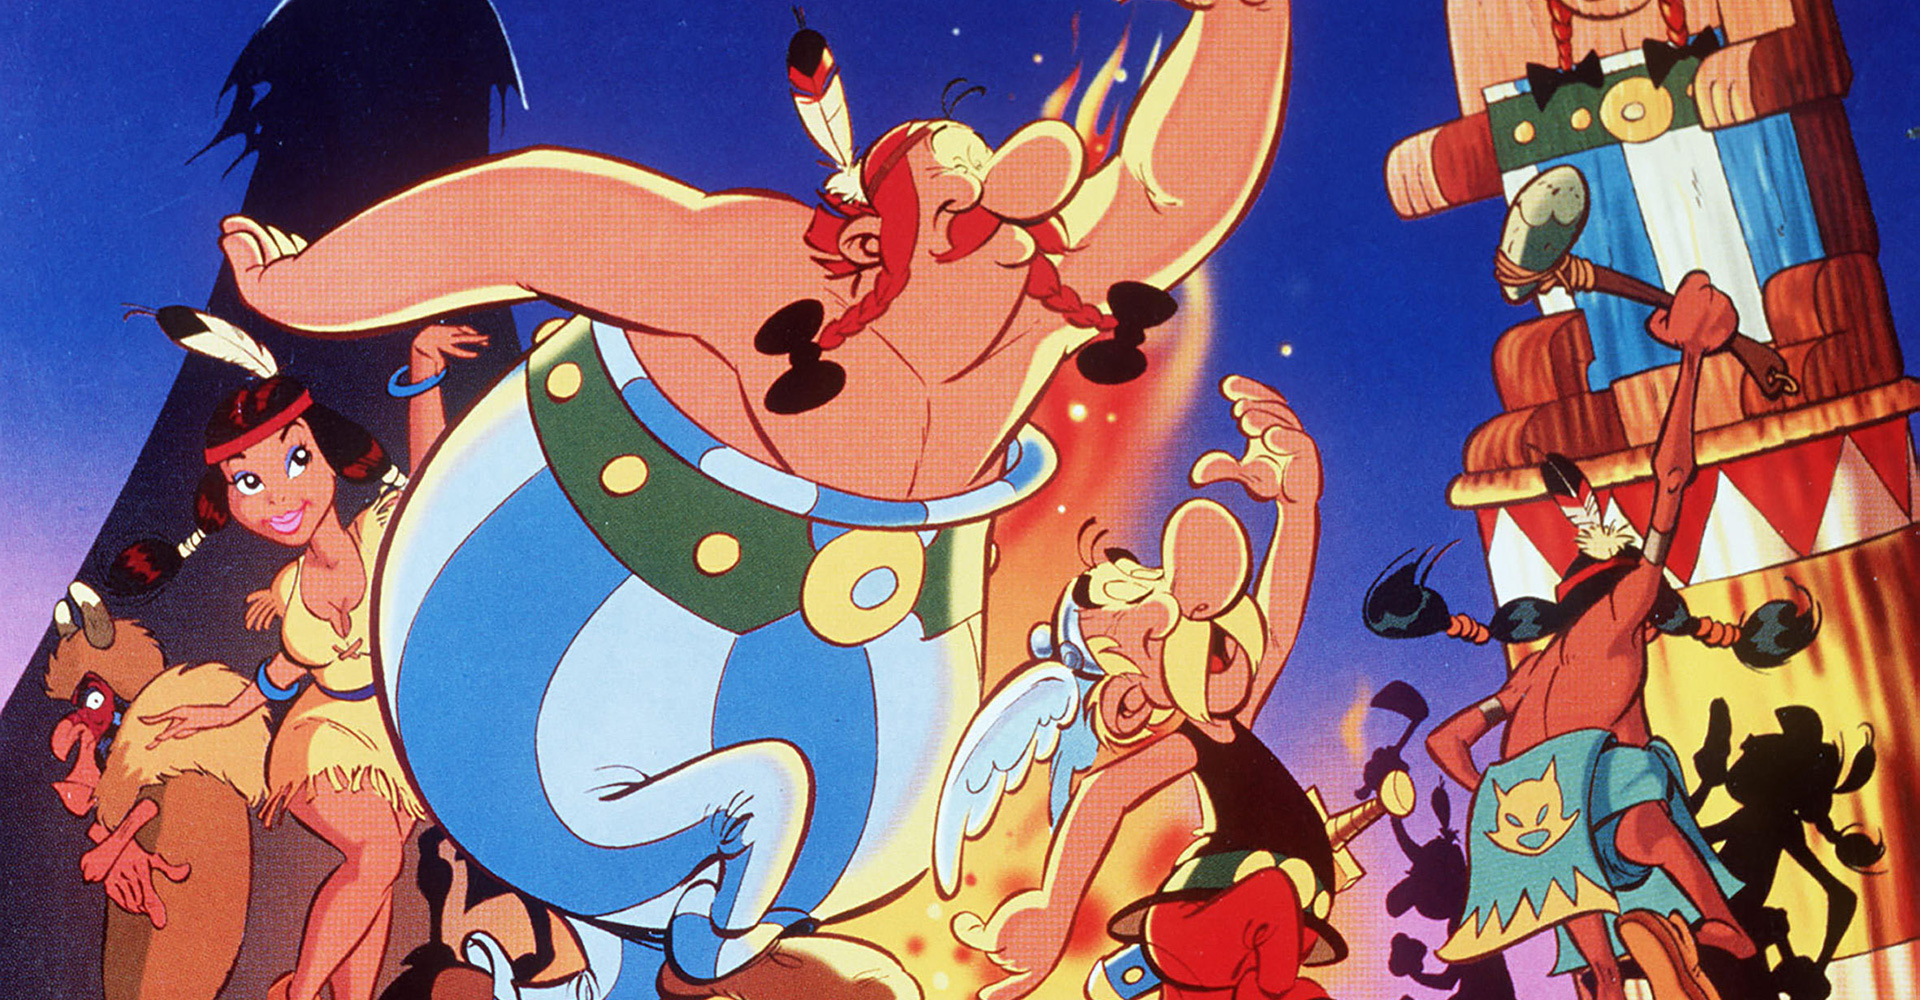 Asterix Und Obelix Film